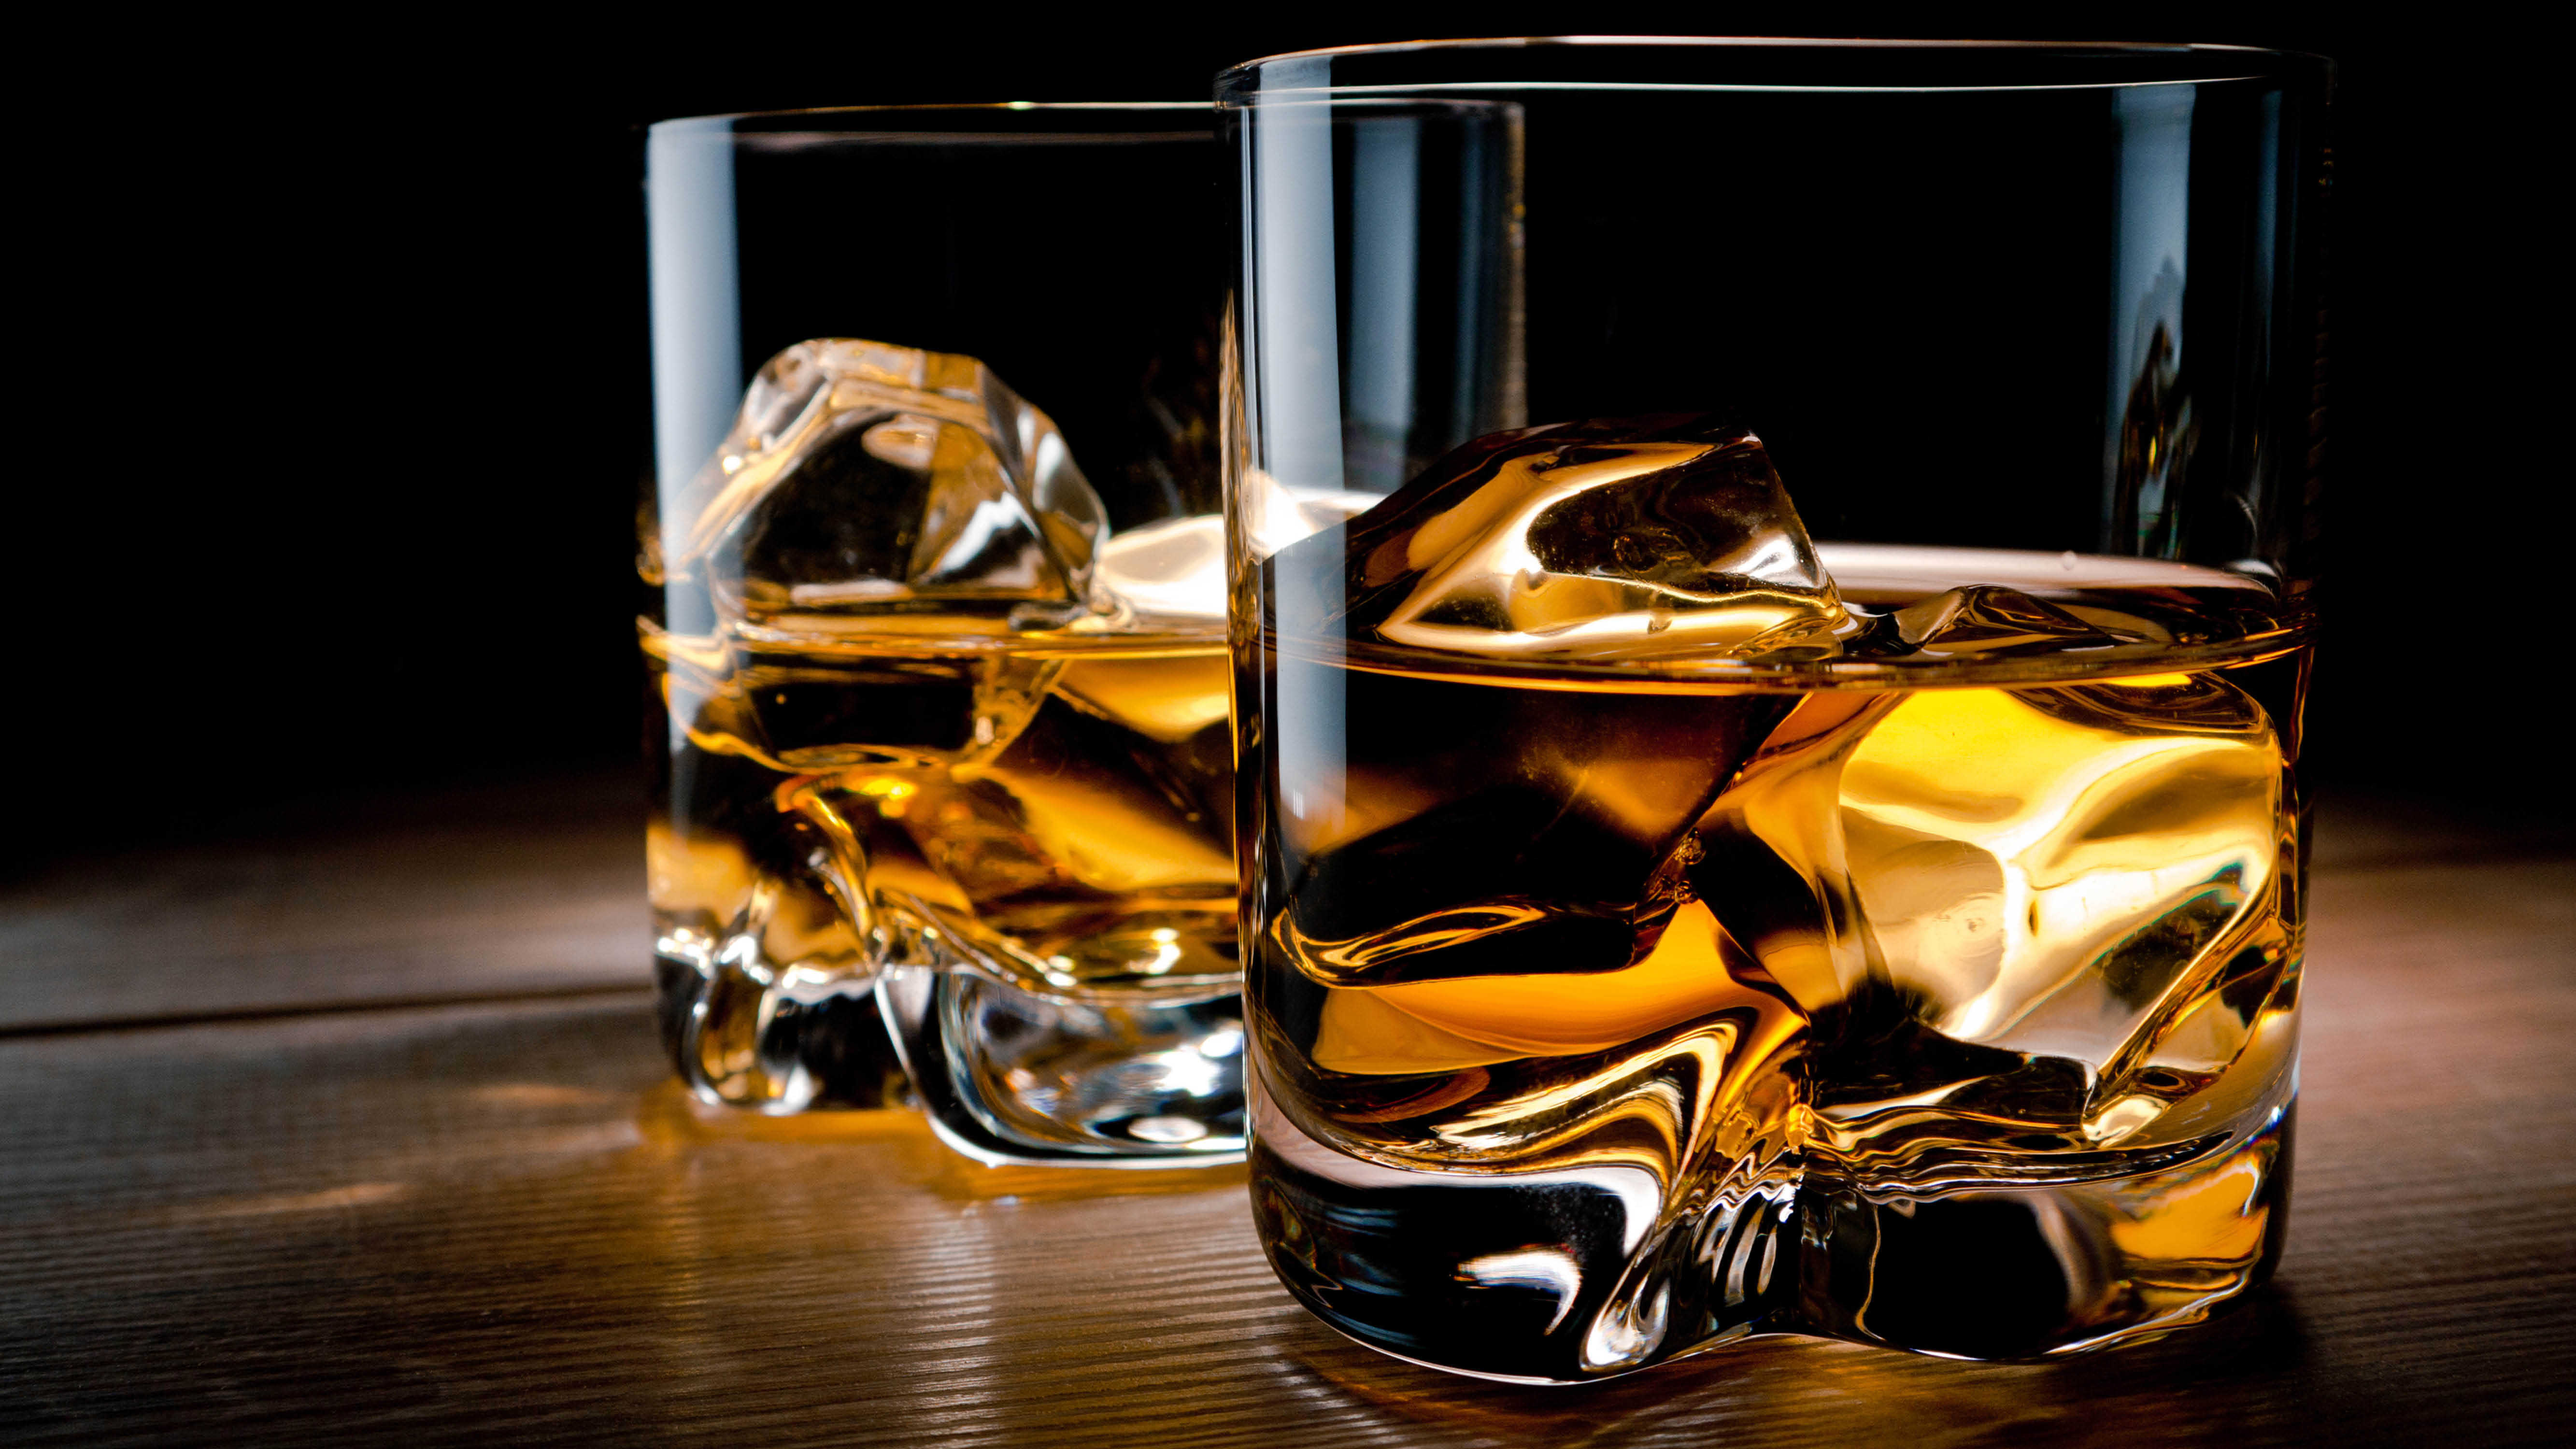 whisky-whisky-neat-dark-profile.jpg